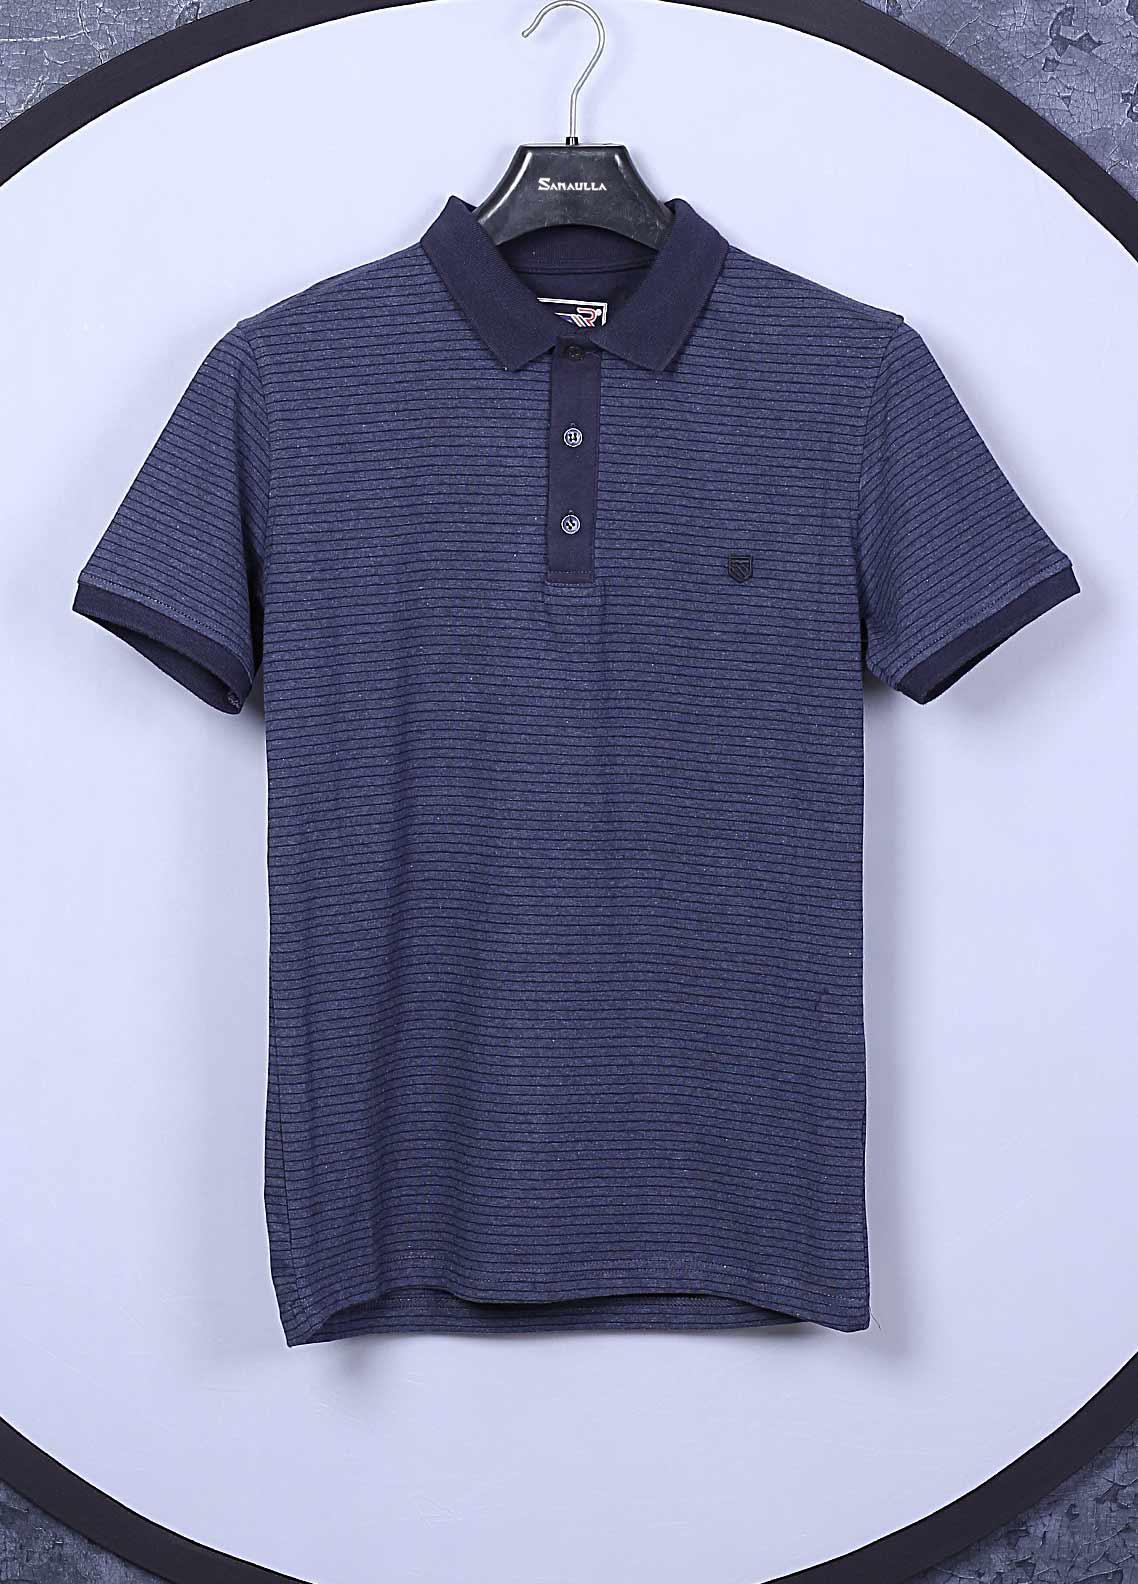 Sanaulla Exclusive Range Cotton Casual Mens T-Shirts -  5351 Blue